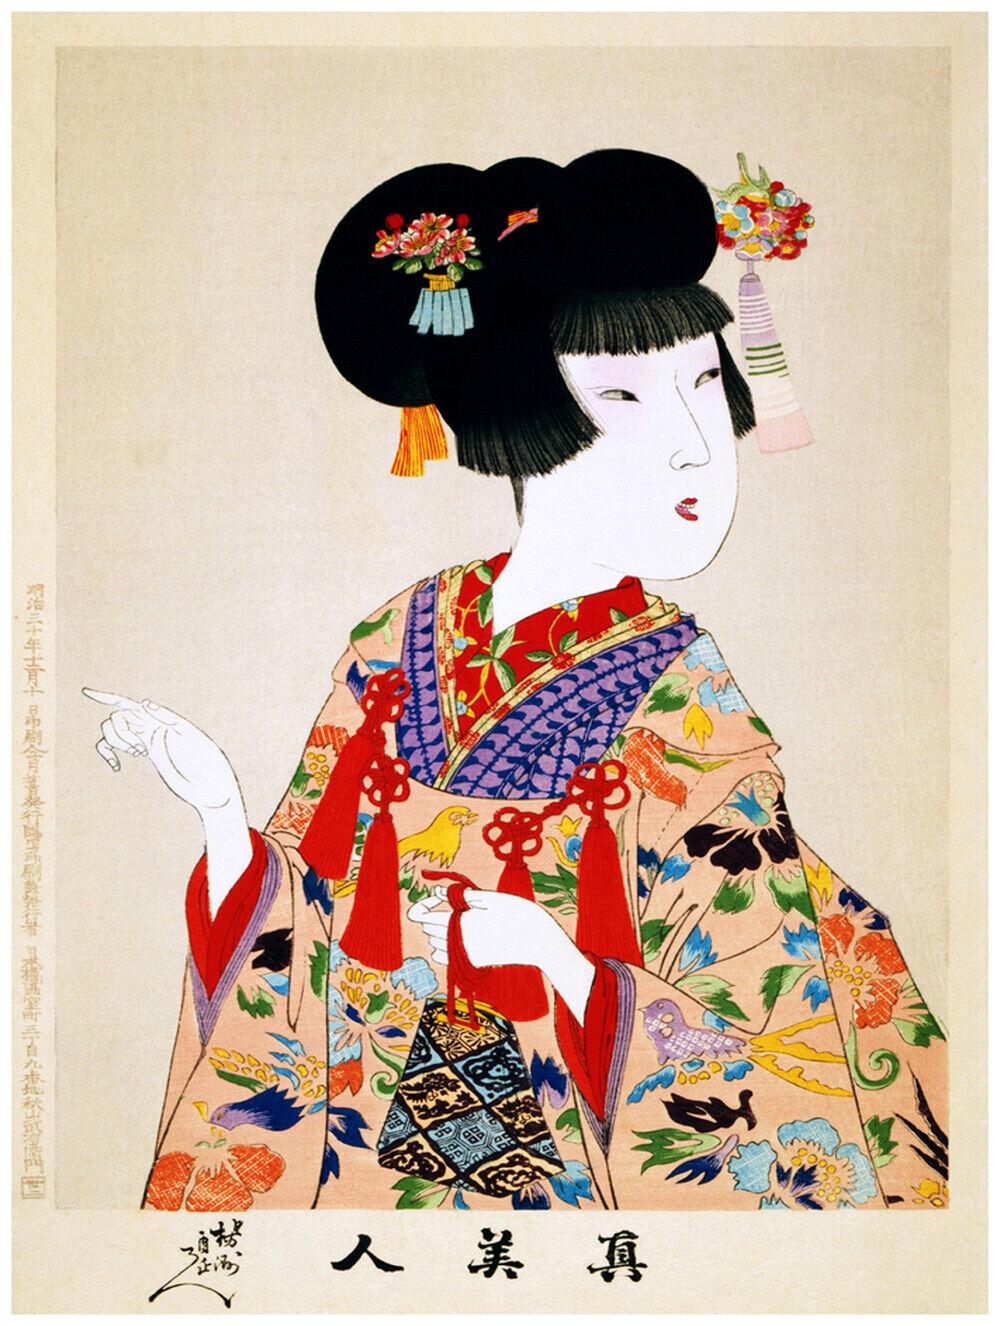 7645.Decoration Poster.Home Room art print.Japanese Geisha girl.Fashion kimono